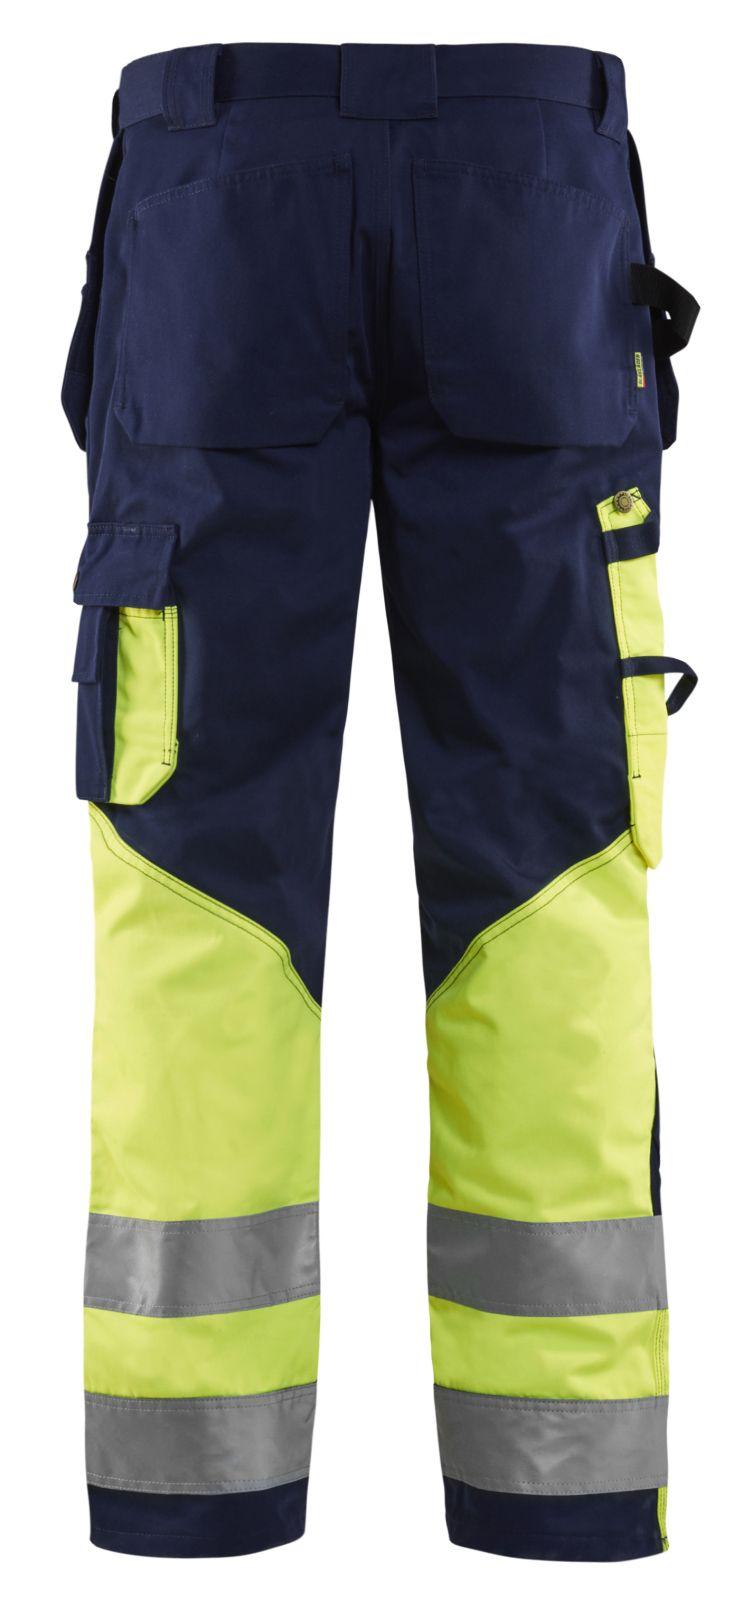 Blaklader Werkbroeken 15291370 High Vis marineblauw-geel(8833)